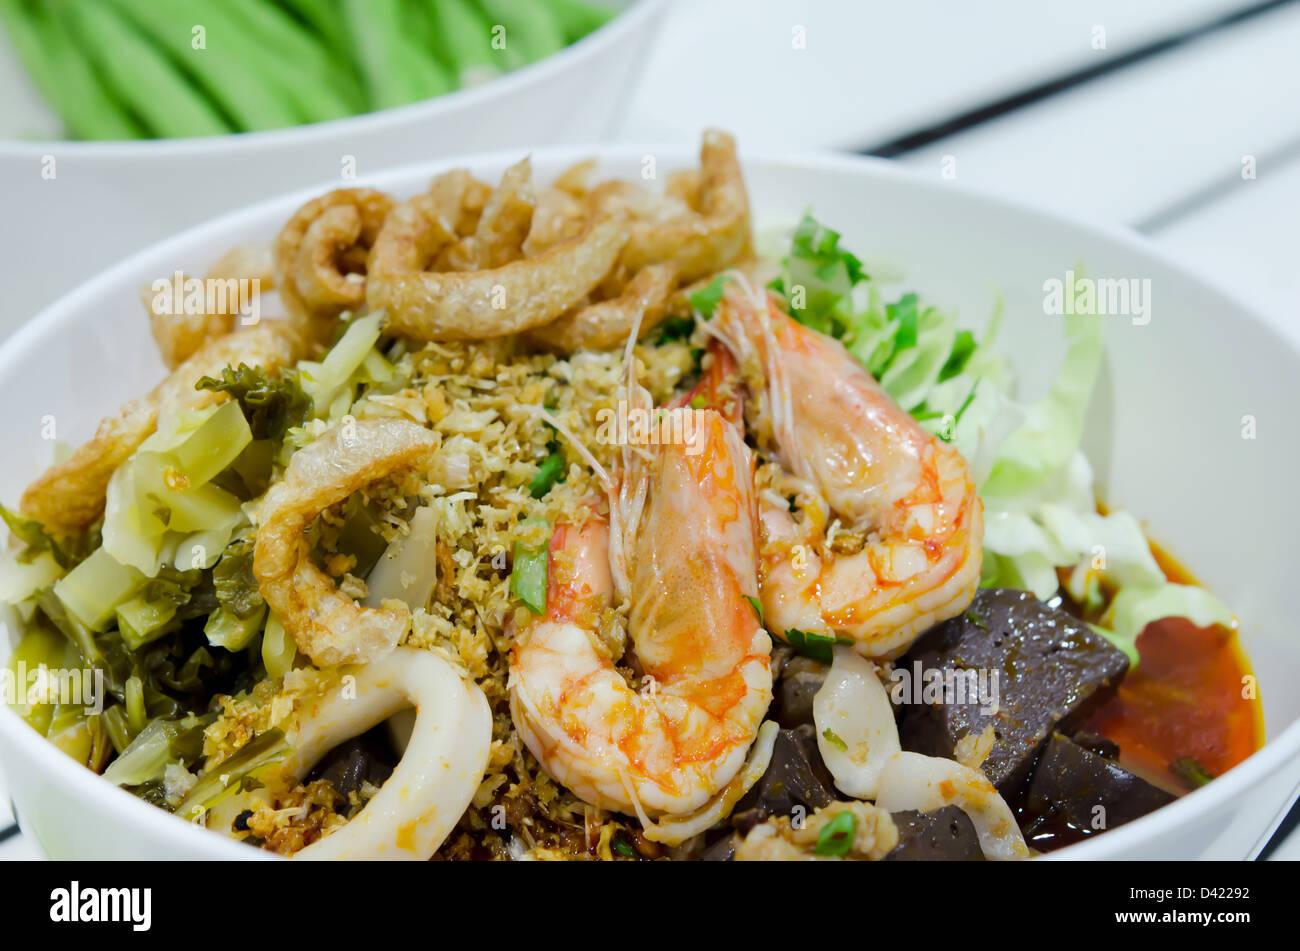 Chiangmai Noodles Stock Photos & Chiangmai Noodles Stock